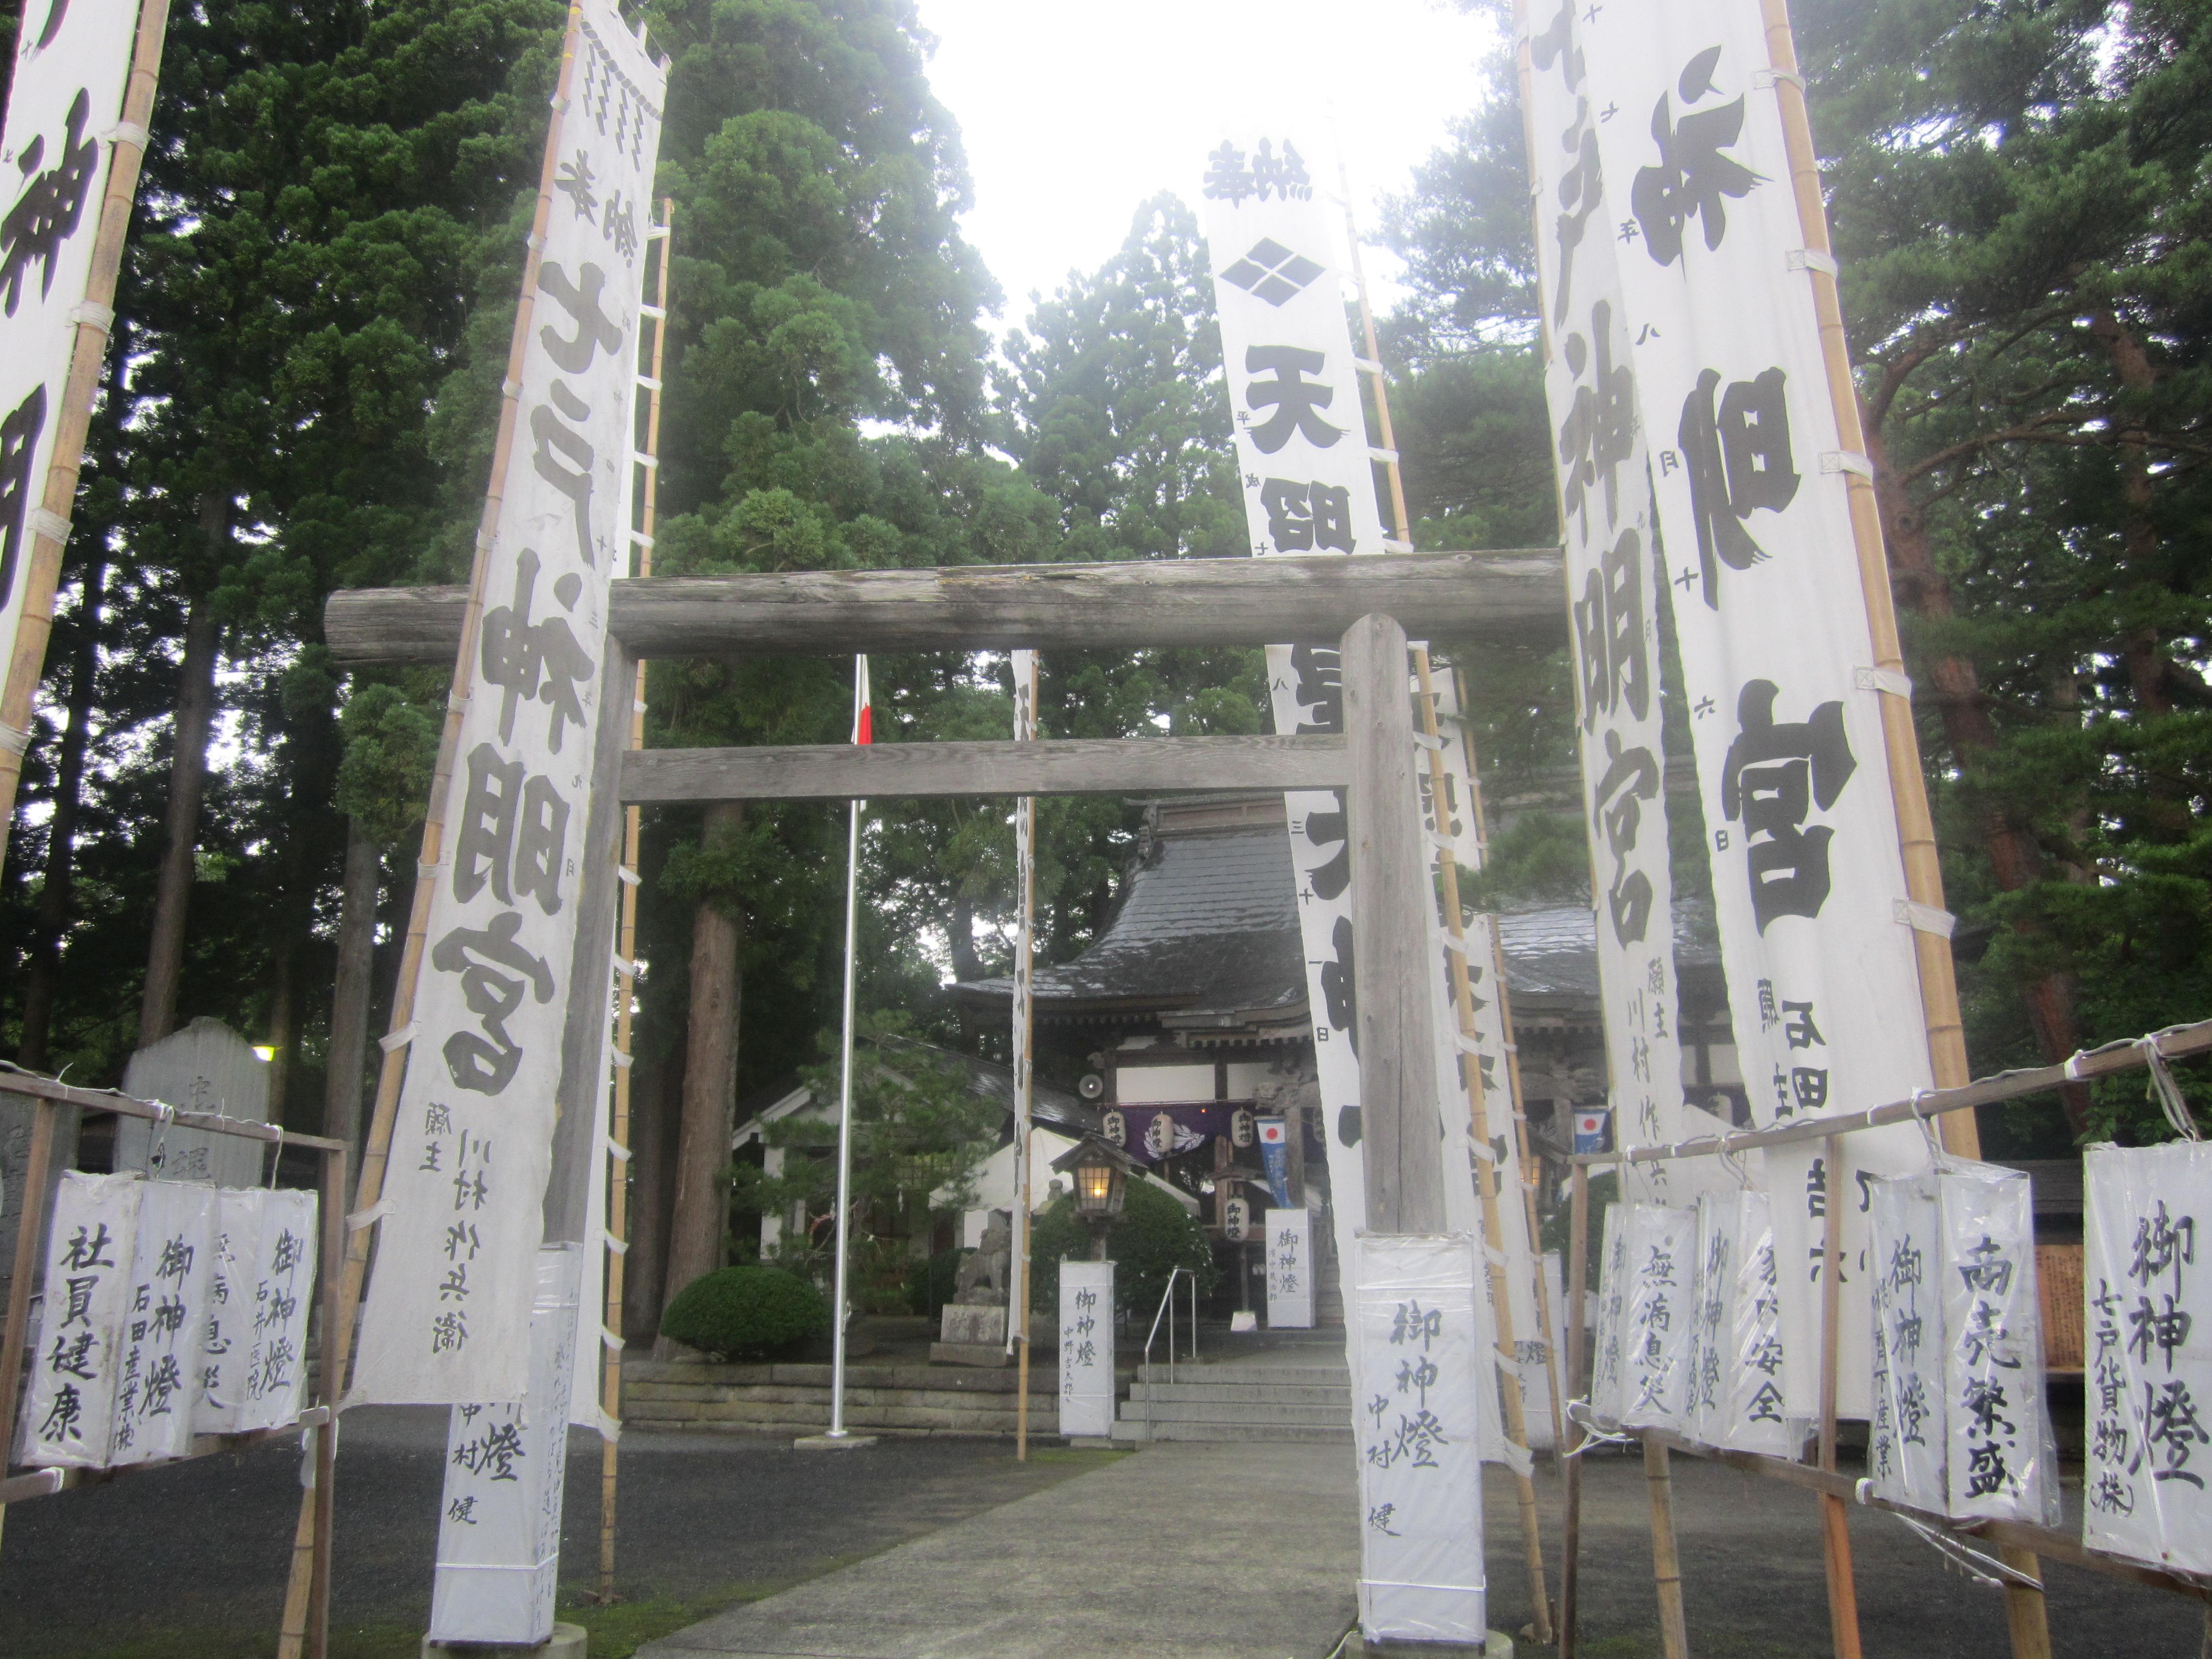 IMG 4231 - 麻布十番納涼祭り25,26日(七戸町出店)